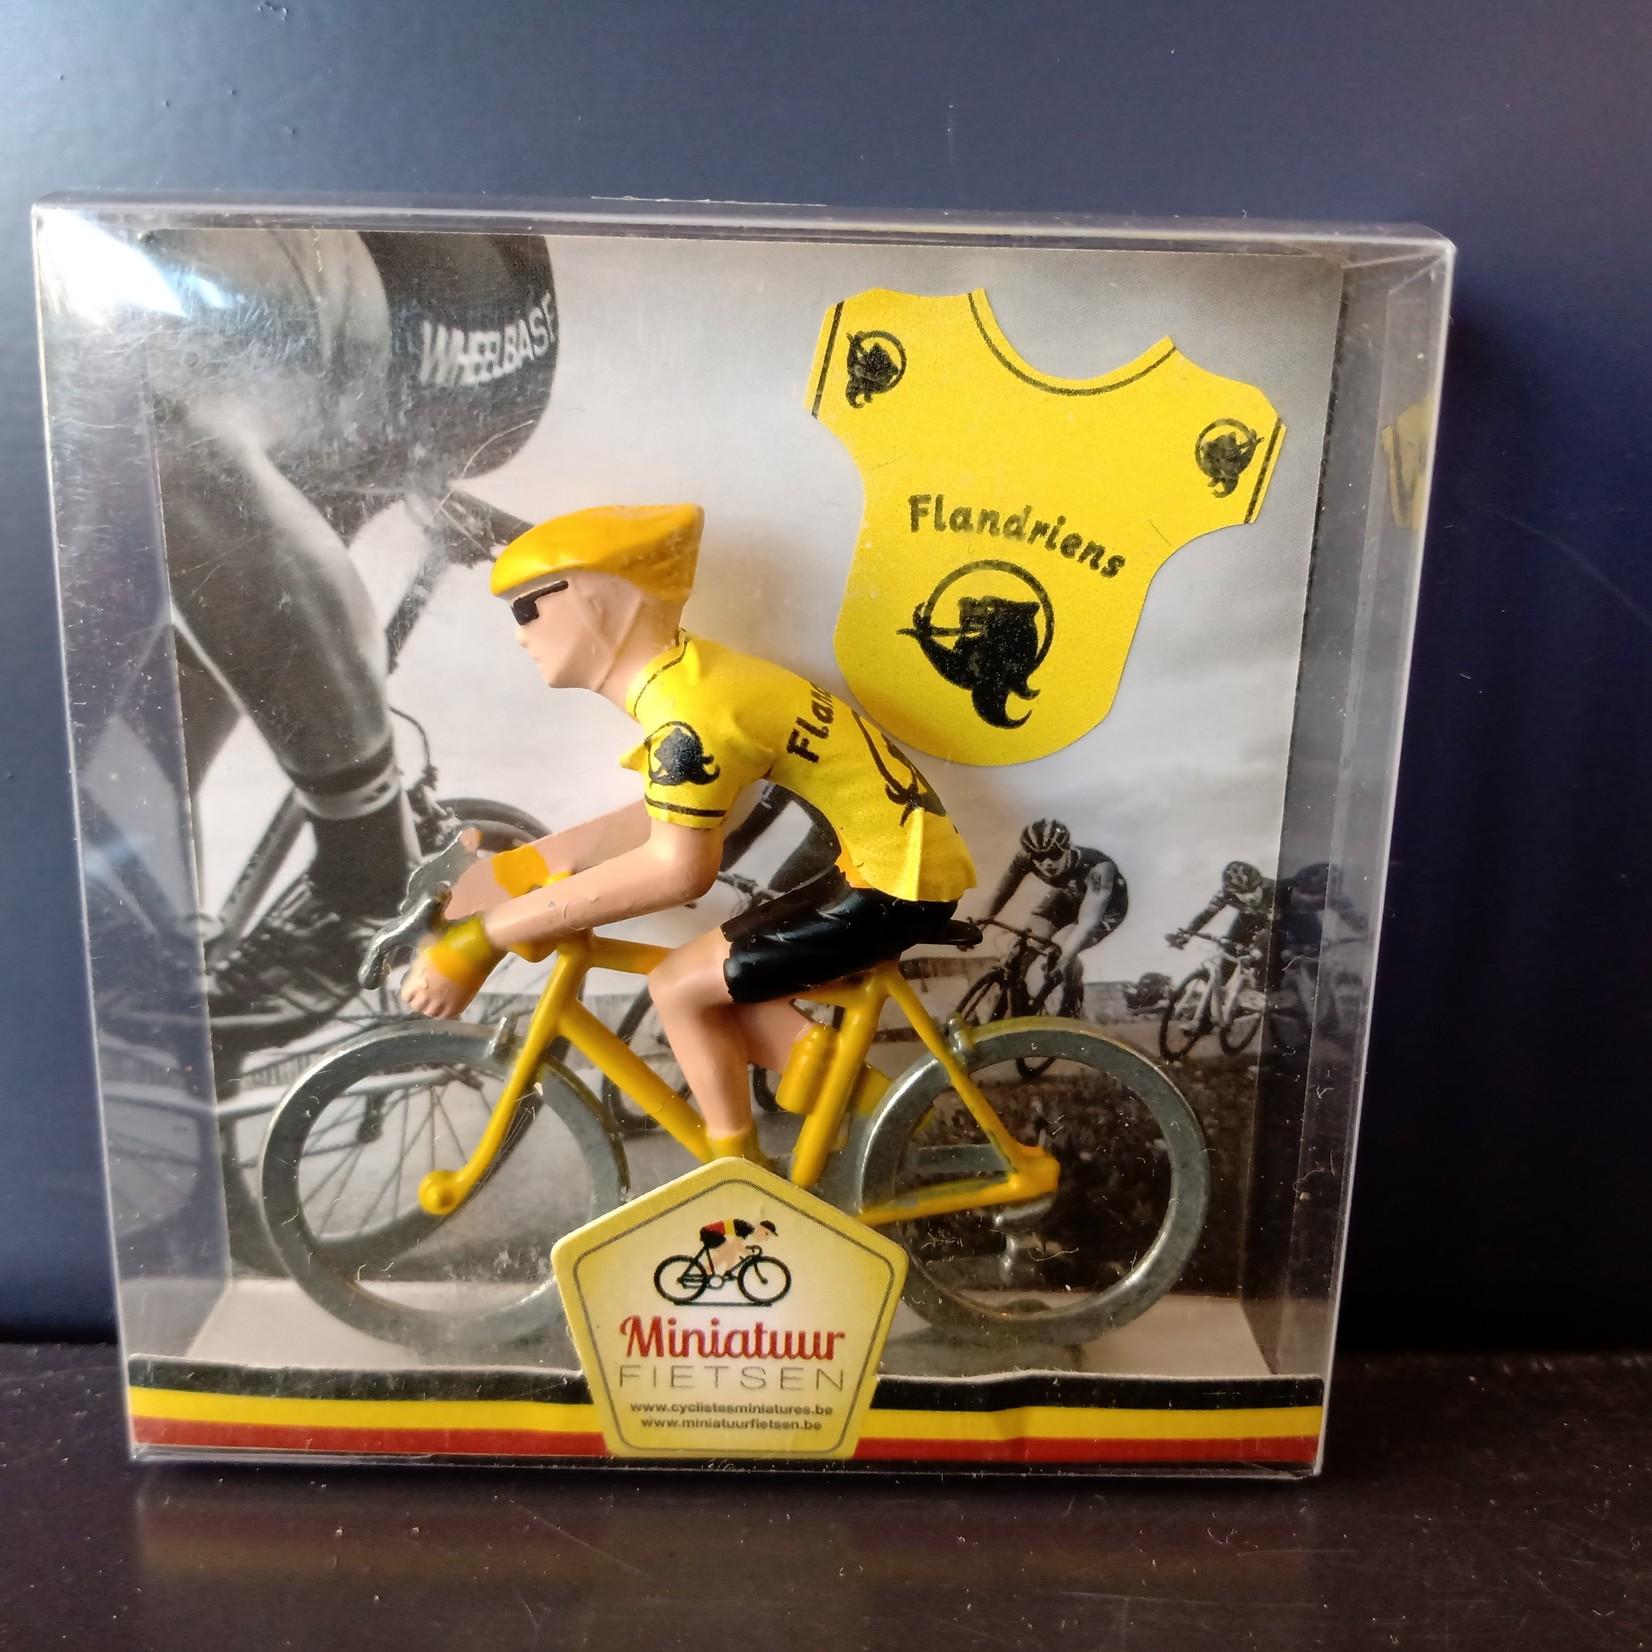 Miniatuur renner Flandriens